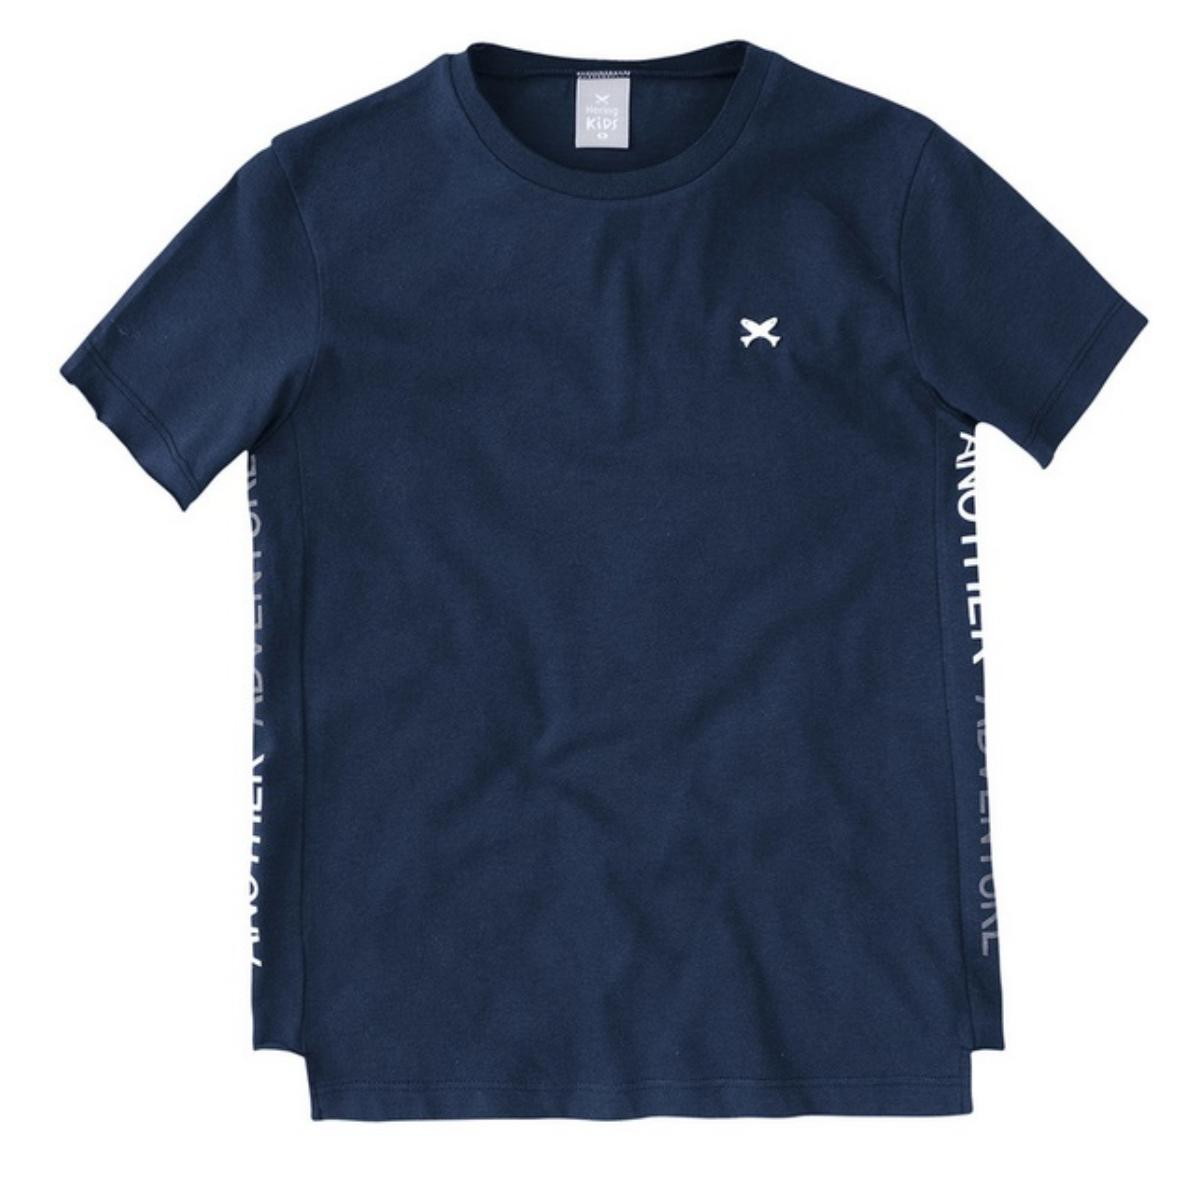 Camiseta Masc Infantil Hering Kids 5cx4 Axten Marinho